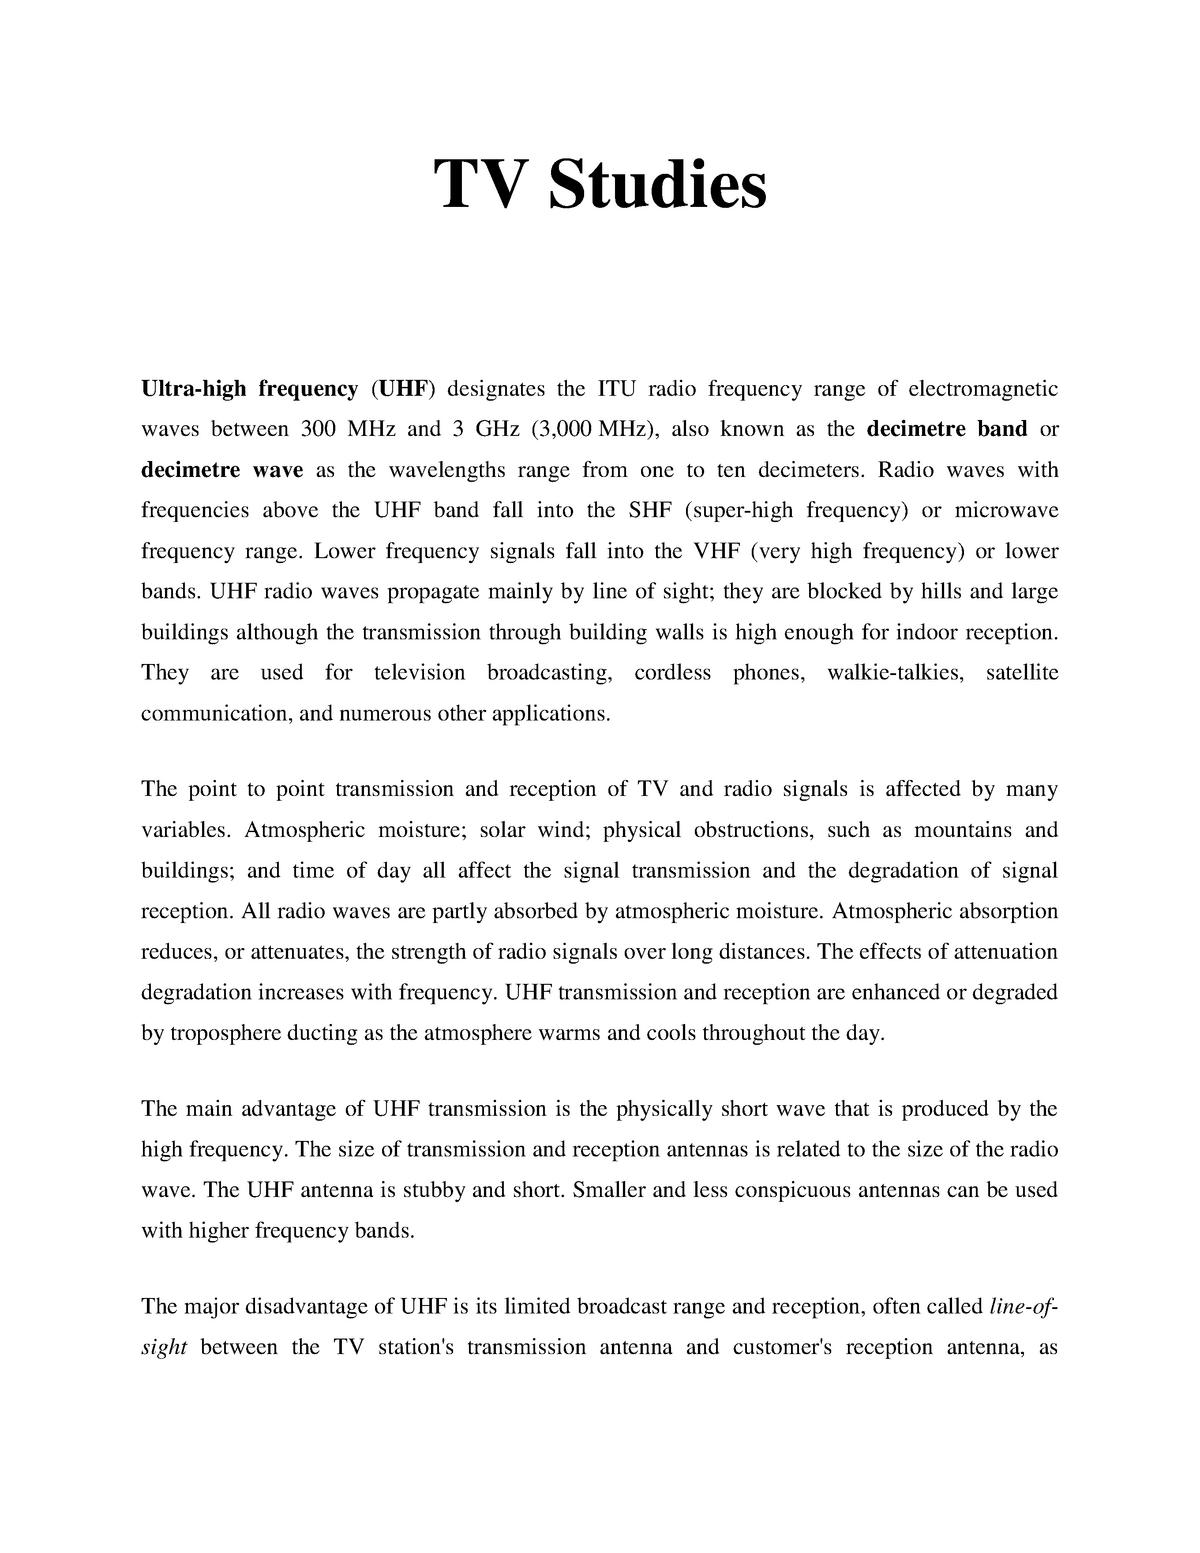 TV studies - Lecture notes 9 - Radio And Television - StuDocu